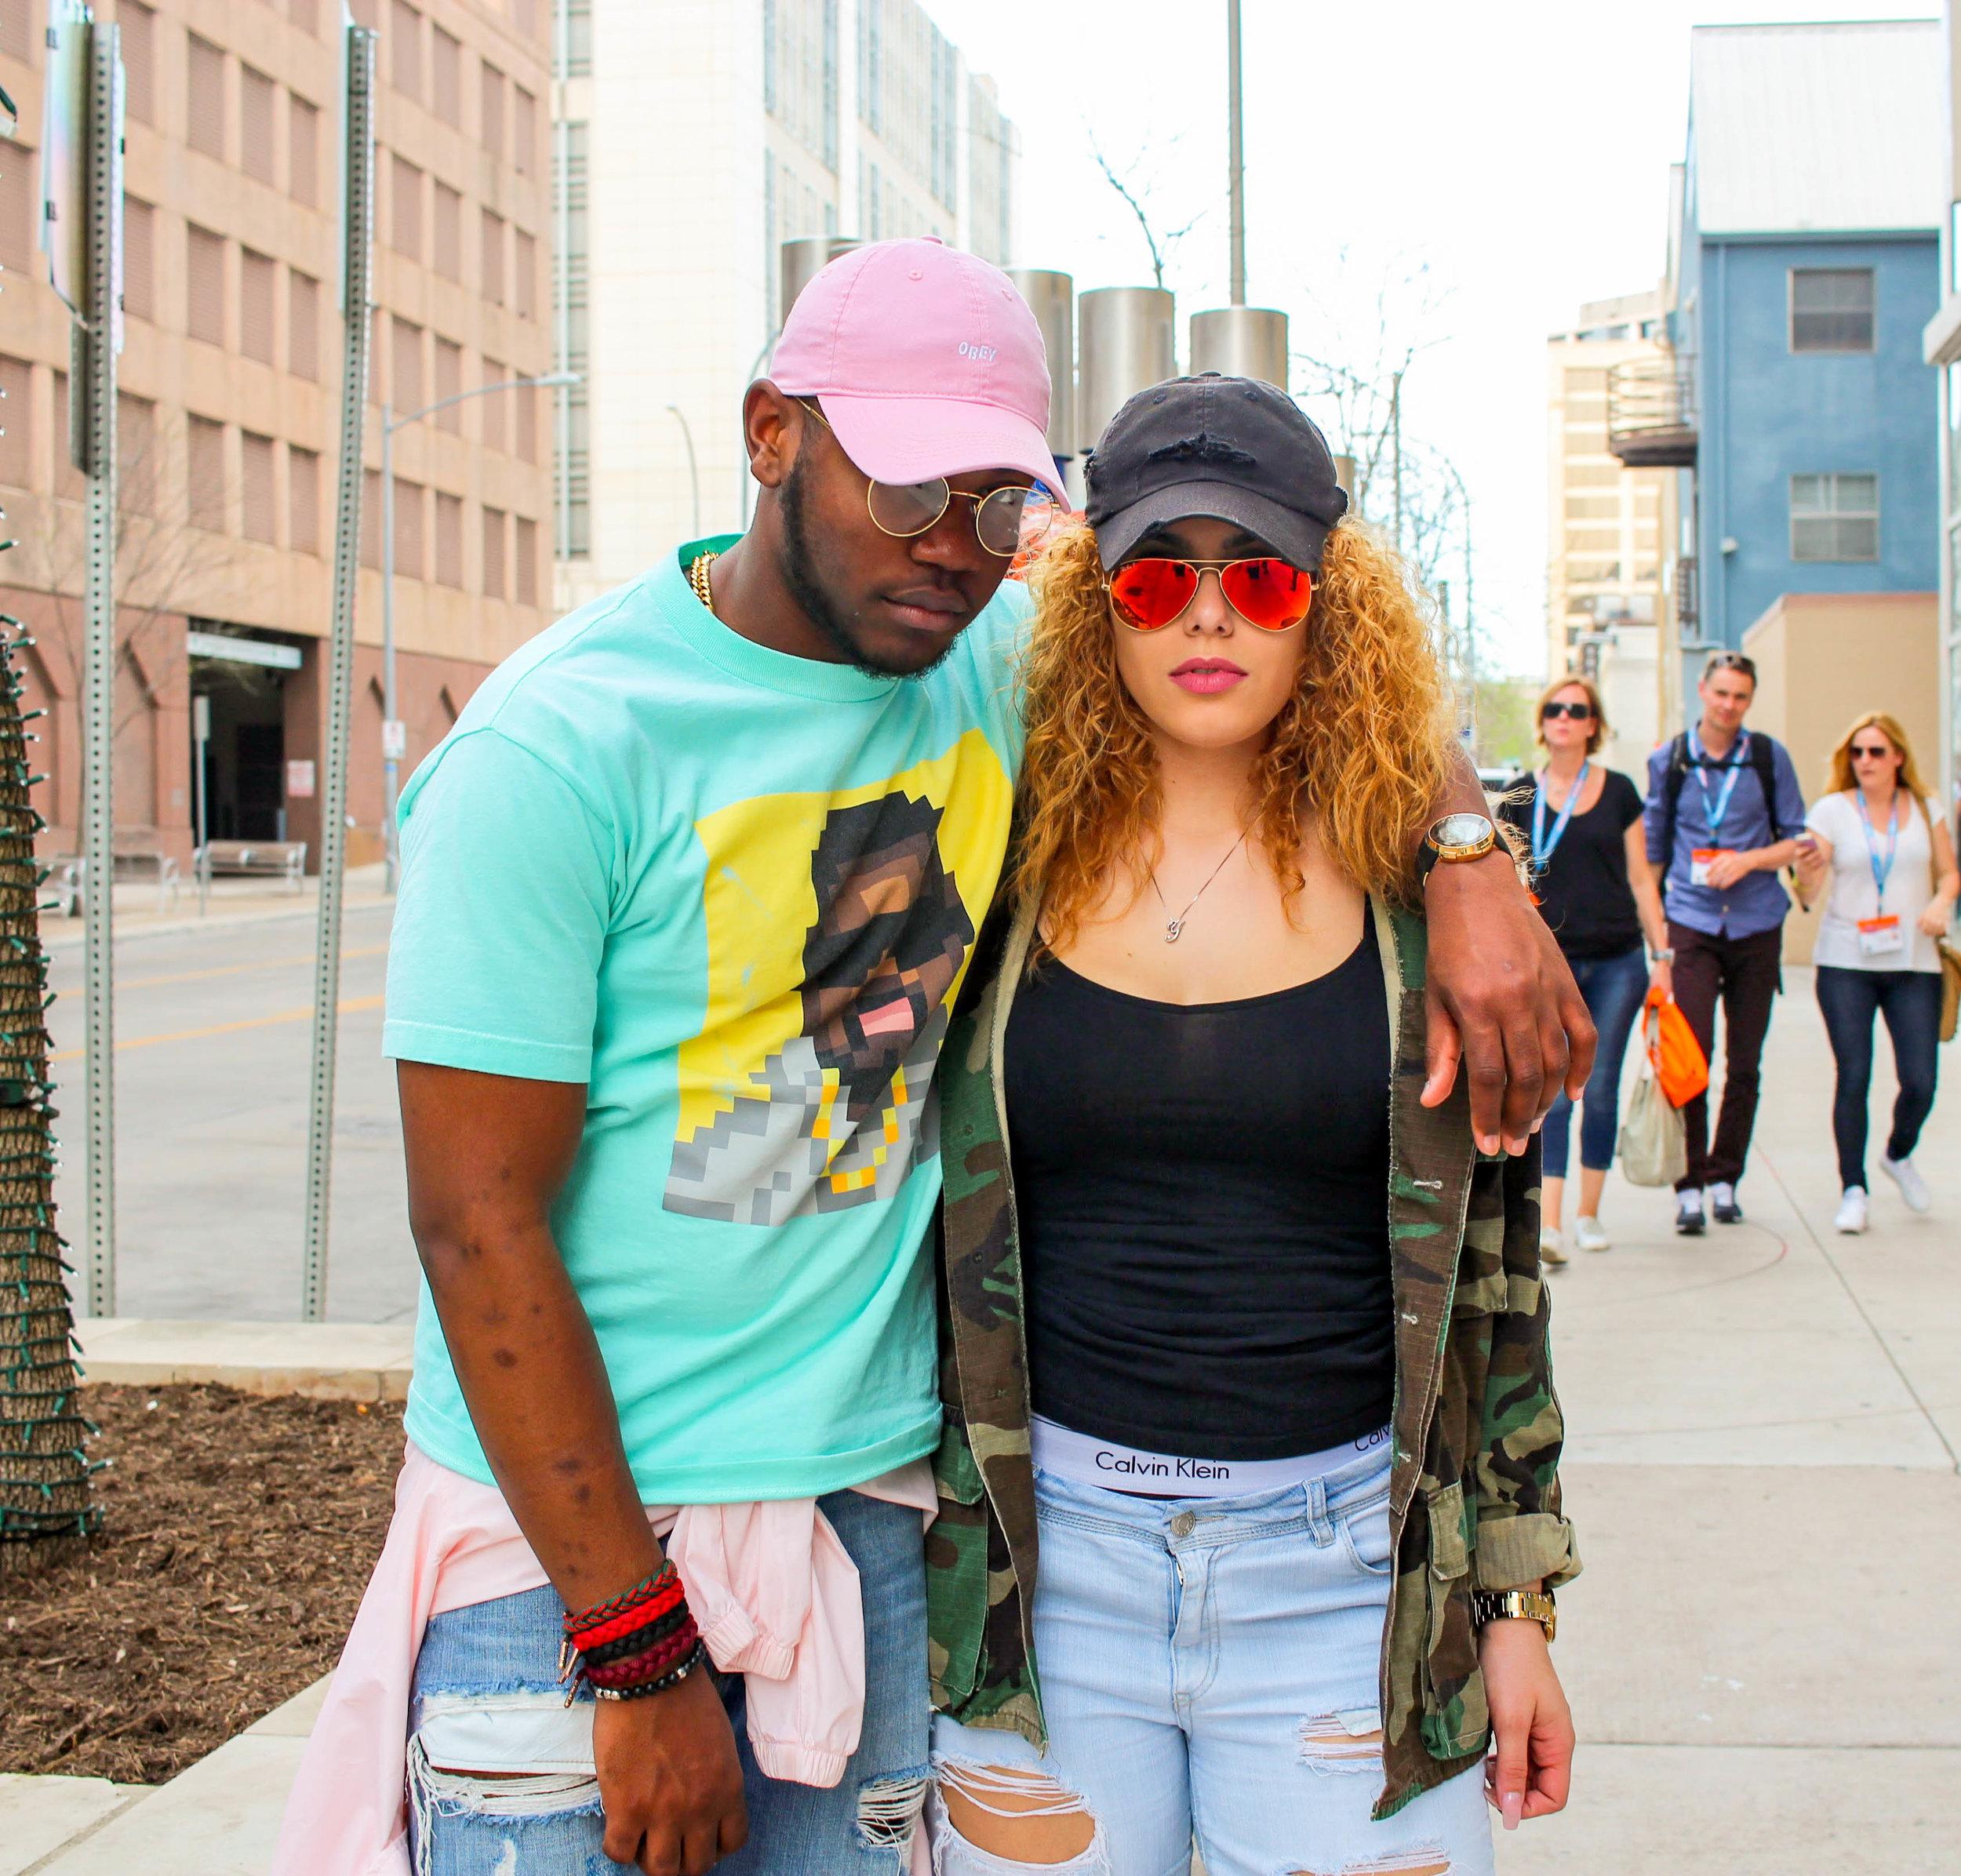 Street Style at SXSW in Austin, TX